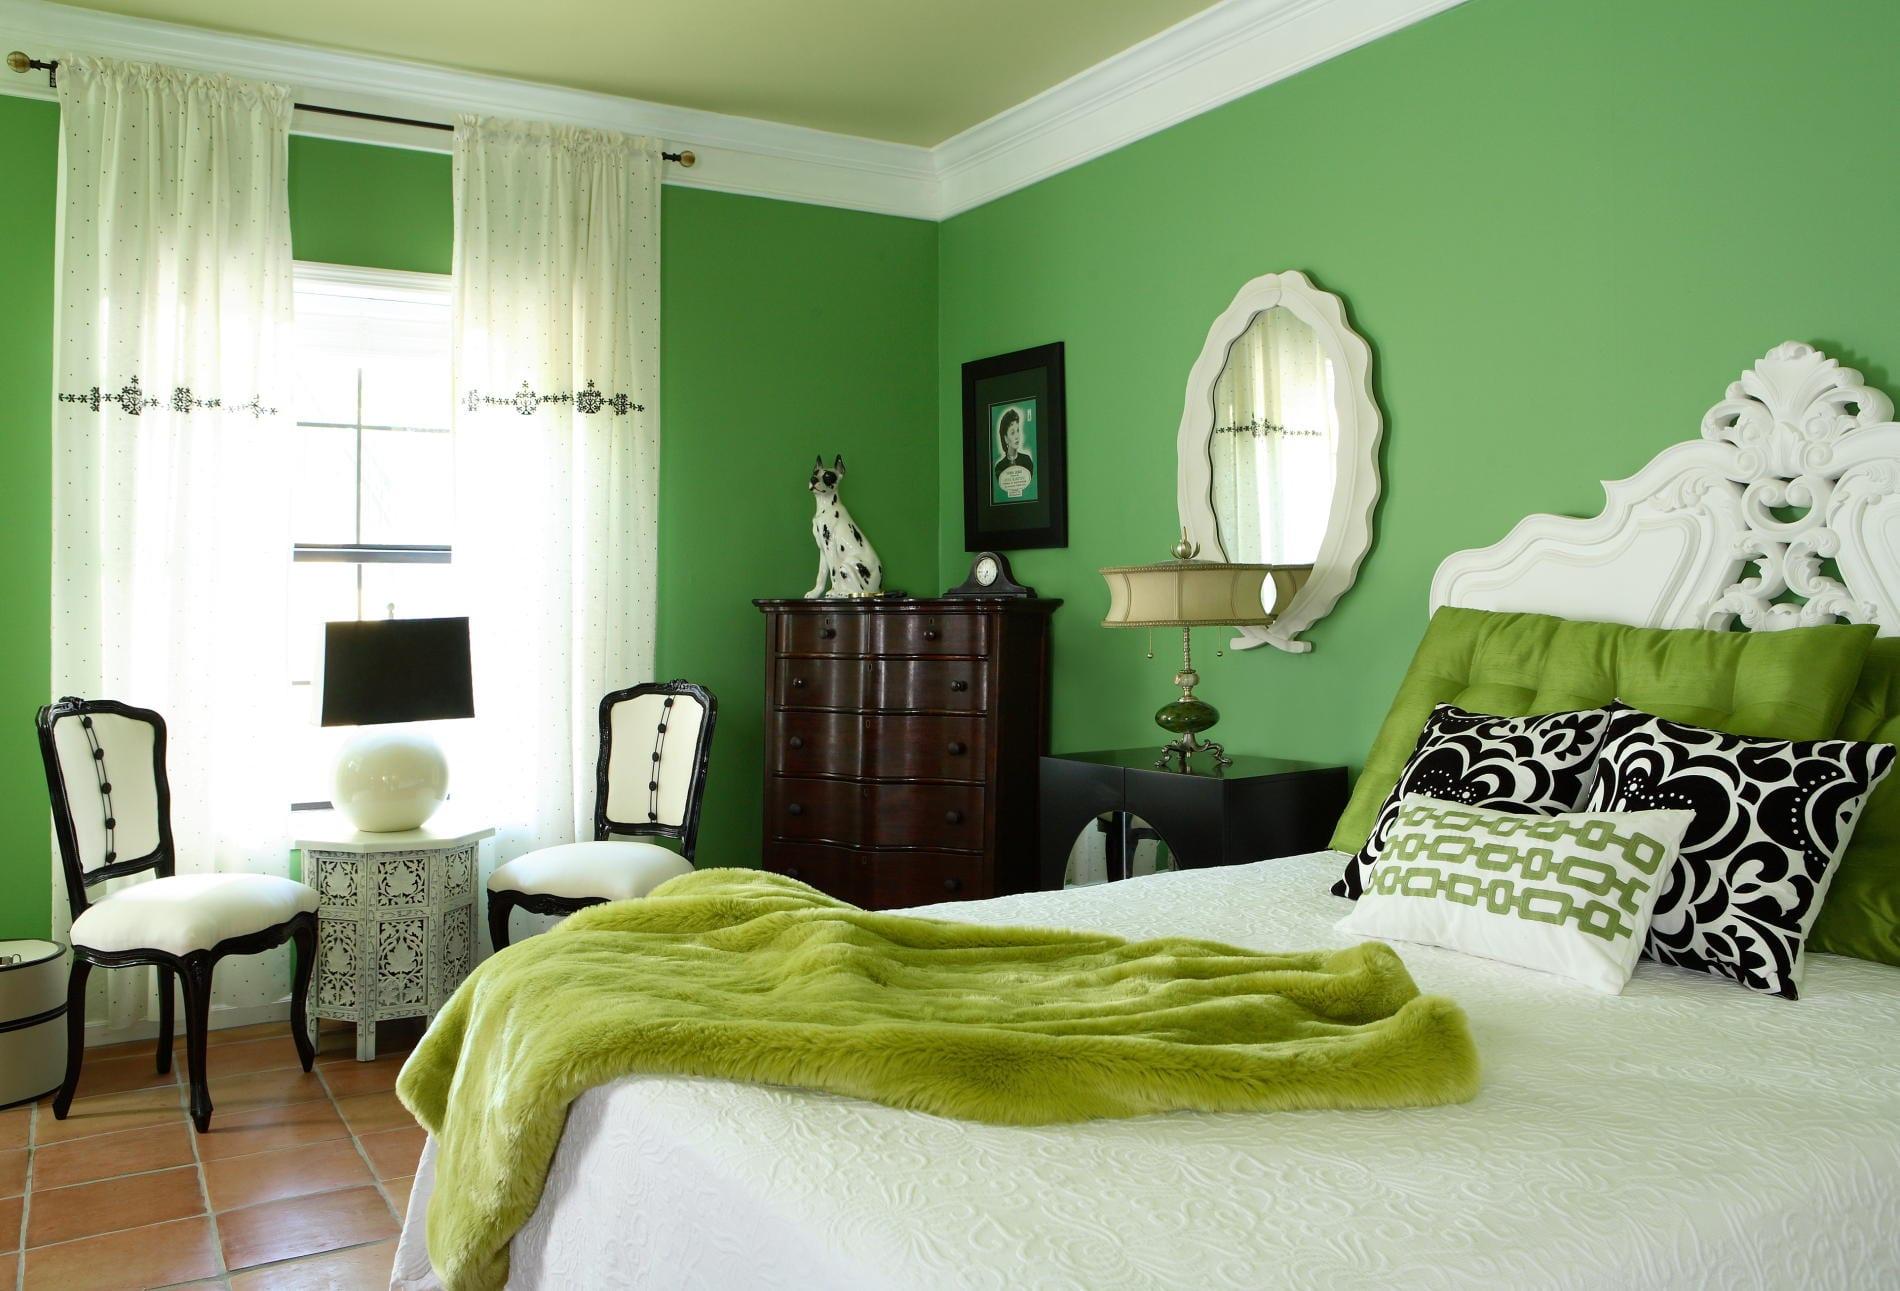 wandgestaltung schlafzimmer mit wandfarbe grün im barock-bettdecke grün